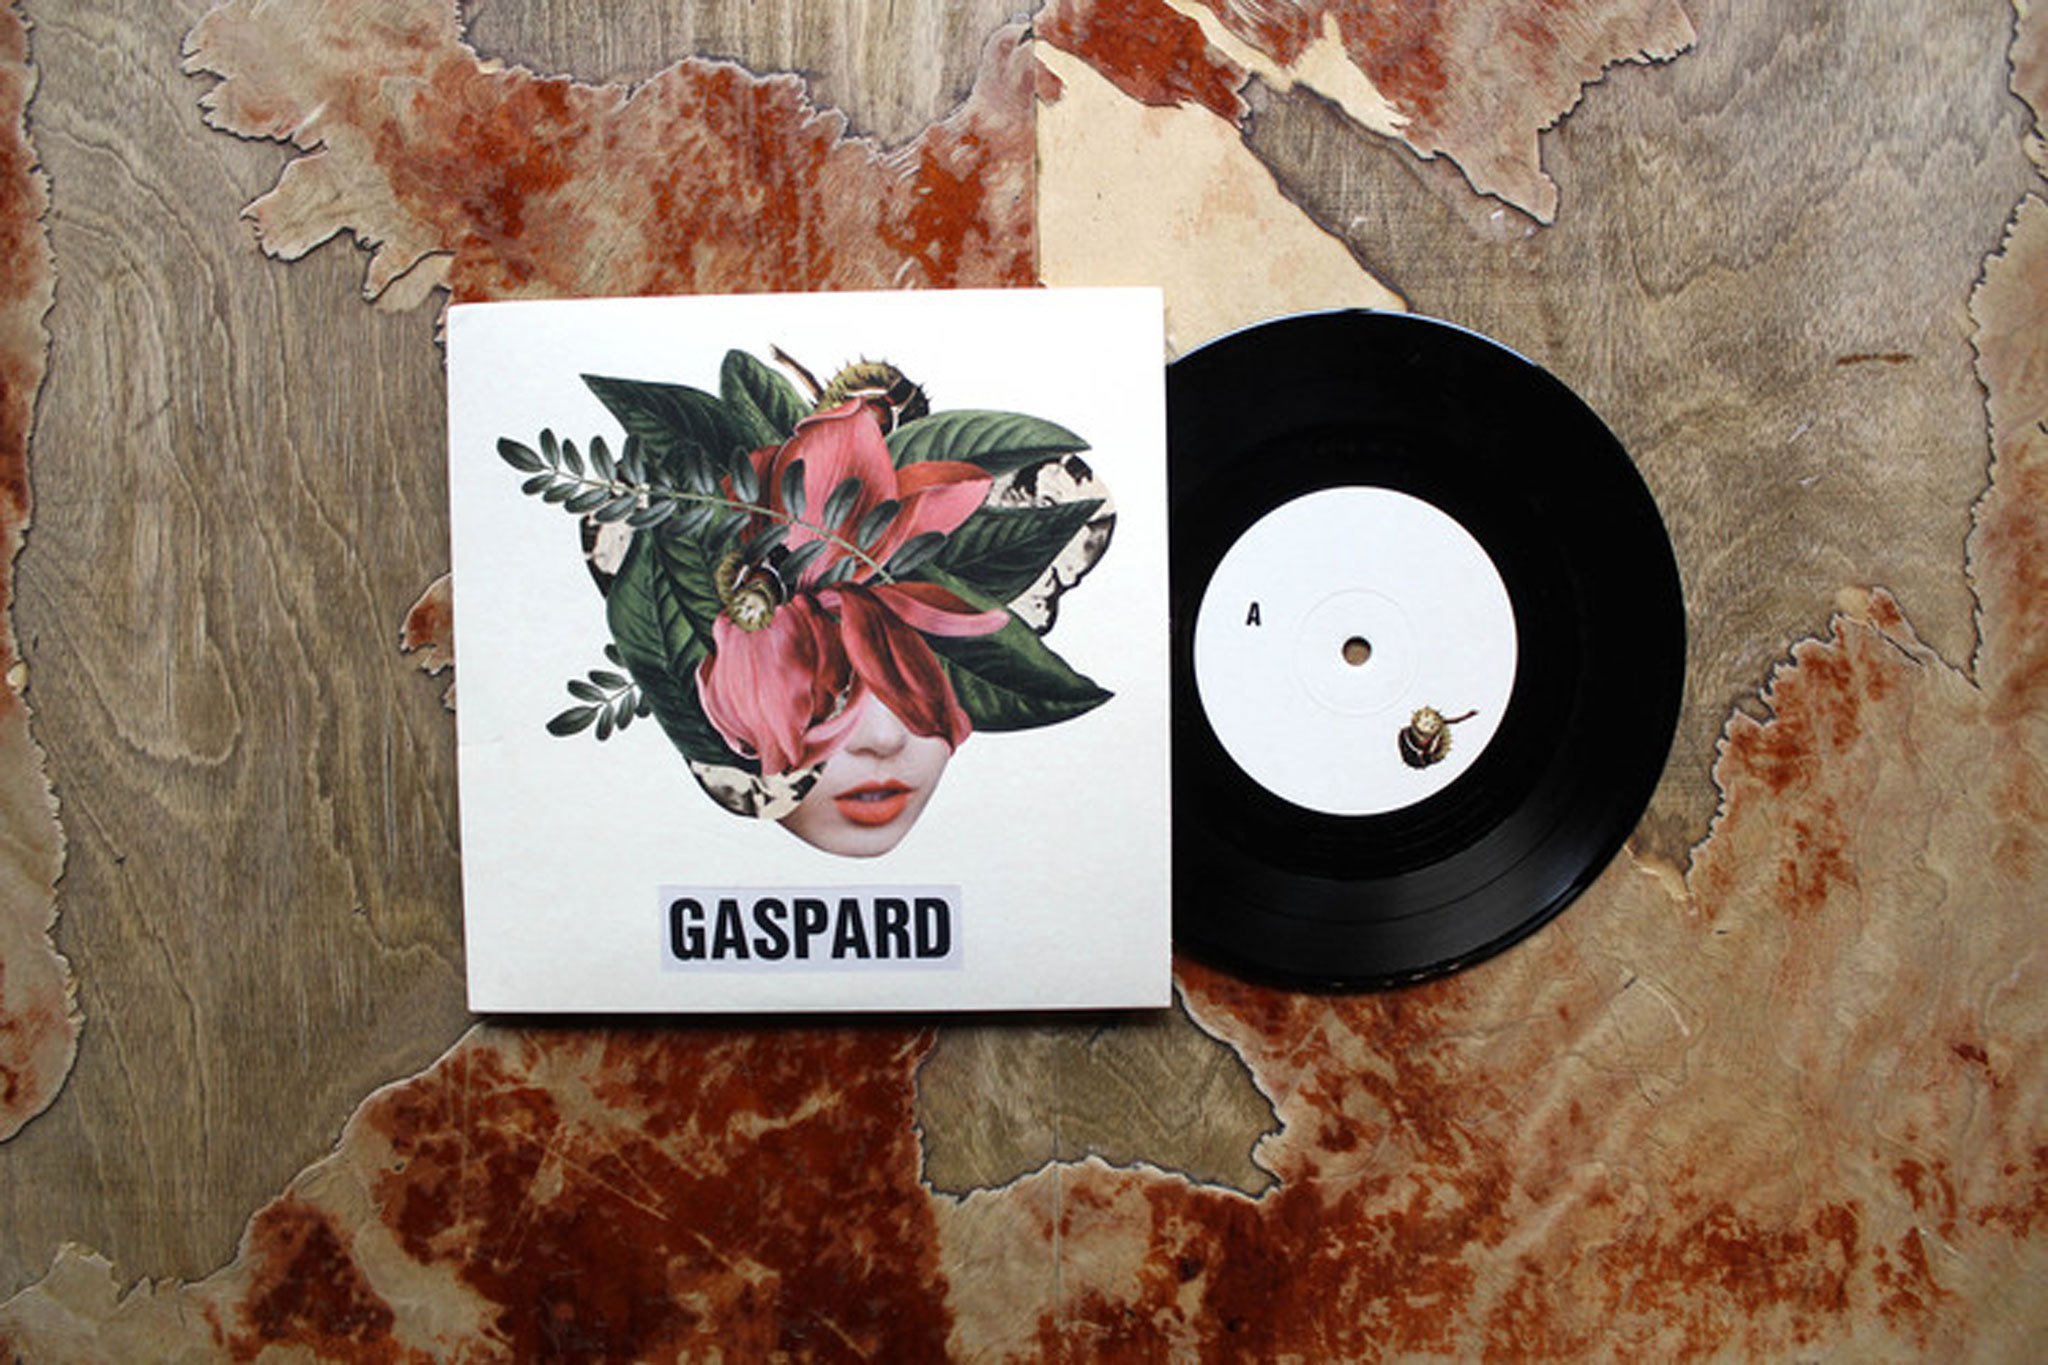 gaspard+ep